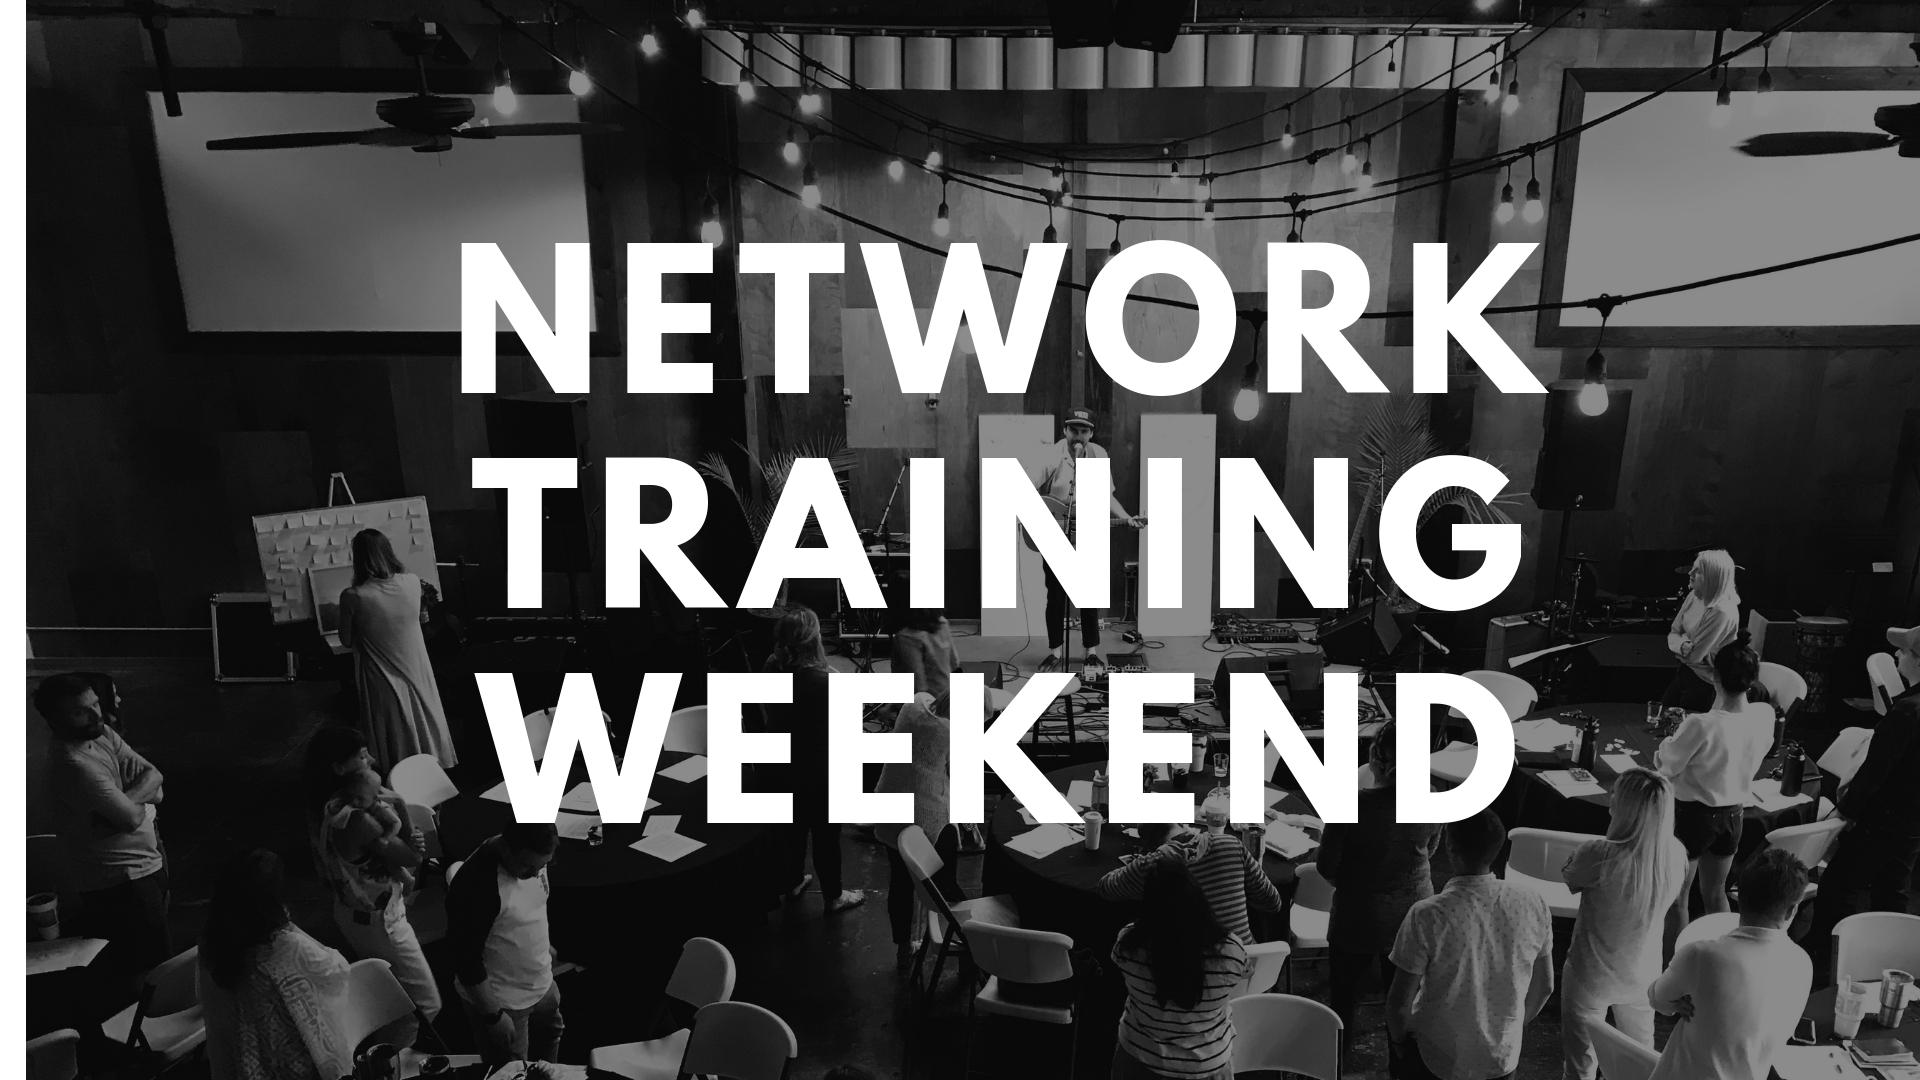 NetworkTrainingWeekend.jpg